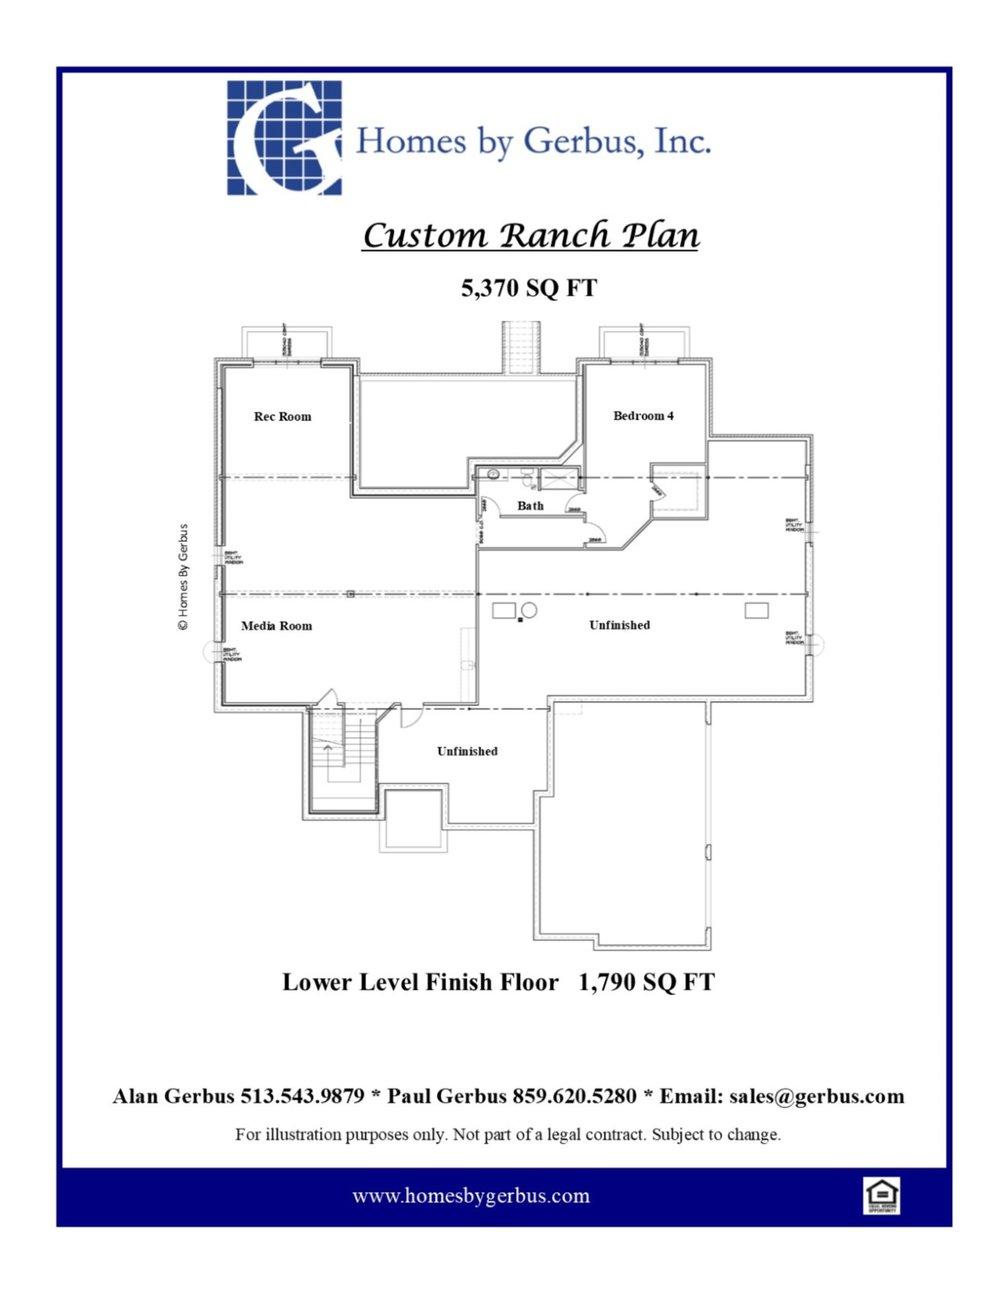 Custom Ranch Satyavolu brochure format Bsmt jpeg.pub.jpg